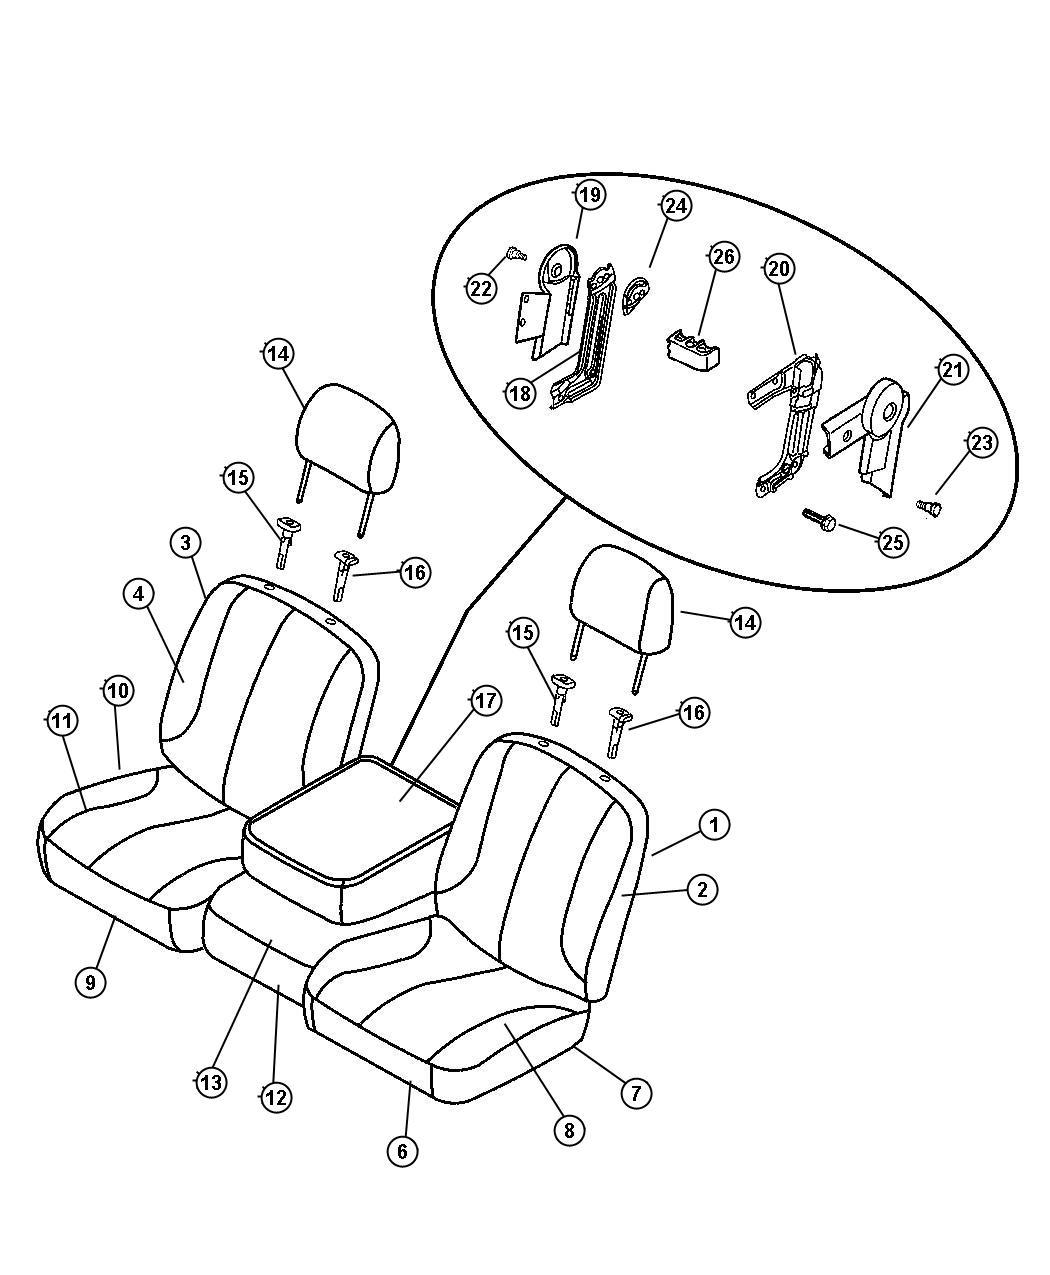 2003 Dodge Ram 1500 Pad. Front seat cushion. Trim: (*vl